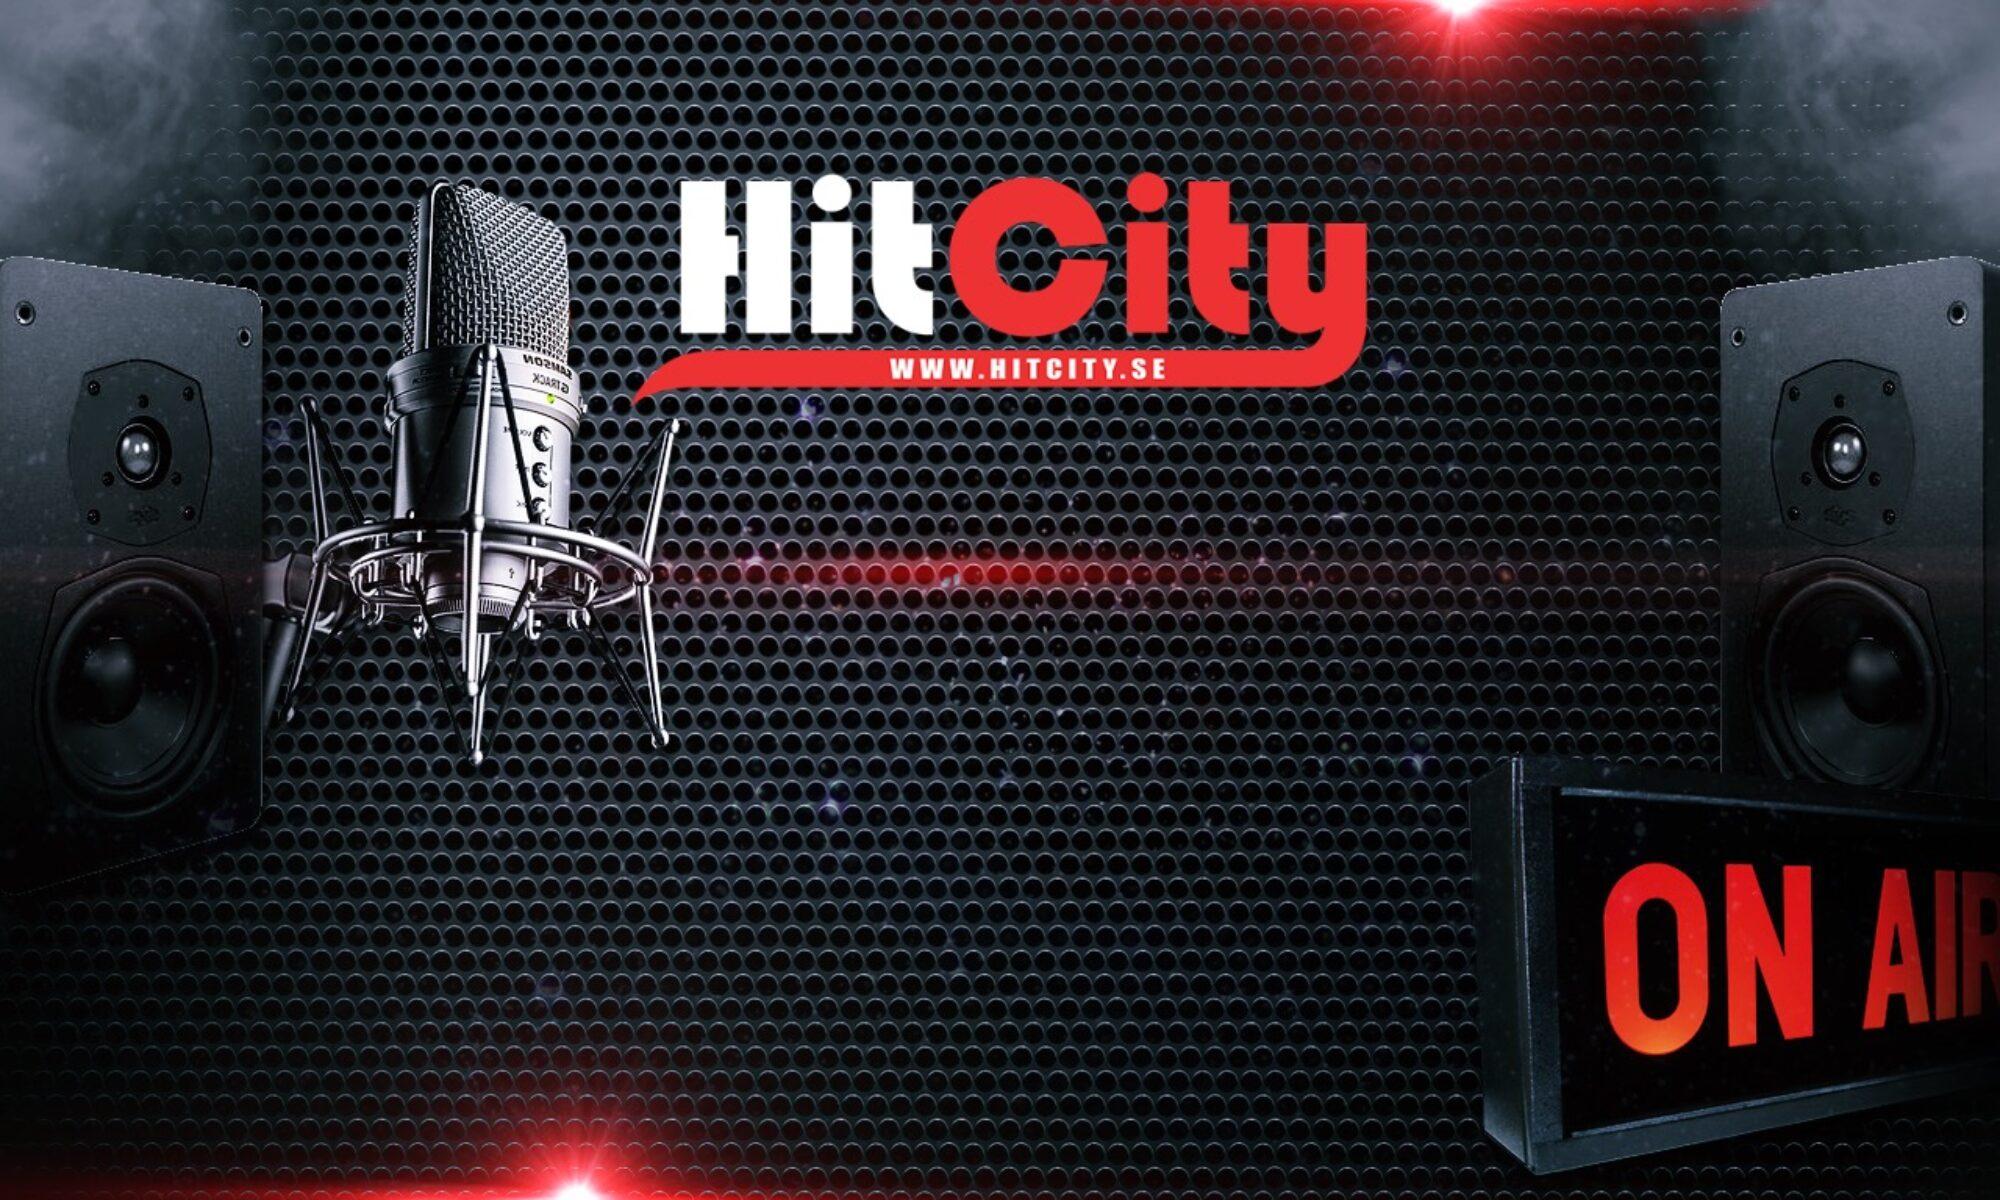 Hitcity Öresund